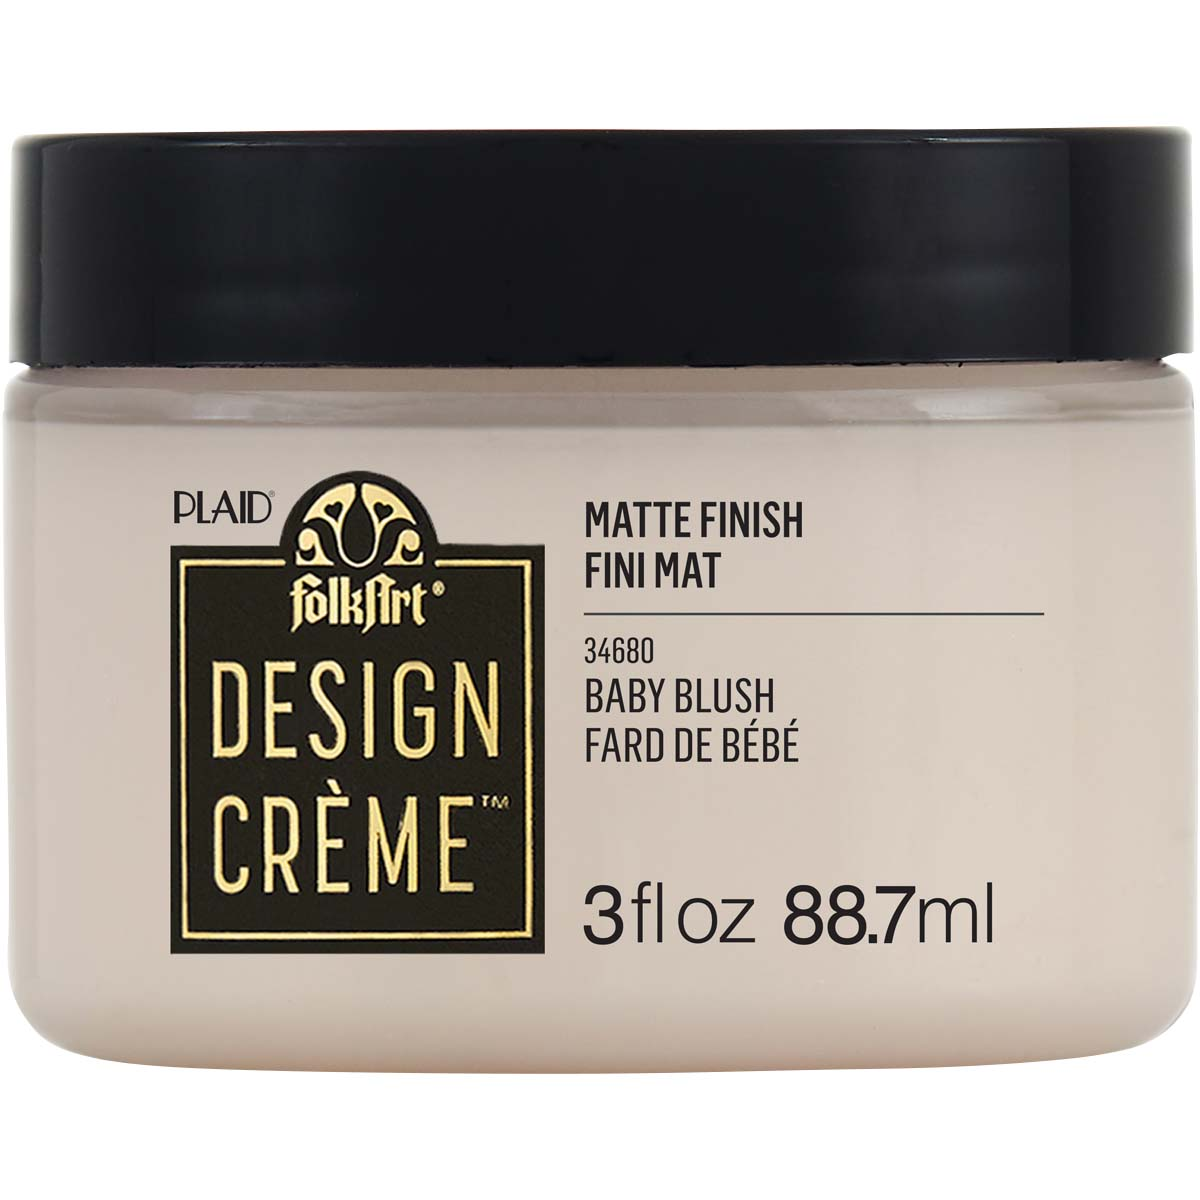 FolkArt ® Design Creme™ - Baby Blush, 3 oz. - 34680